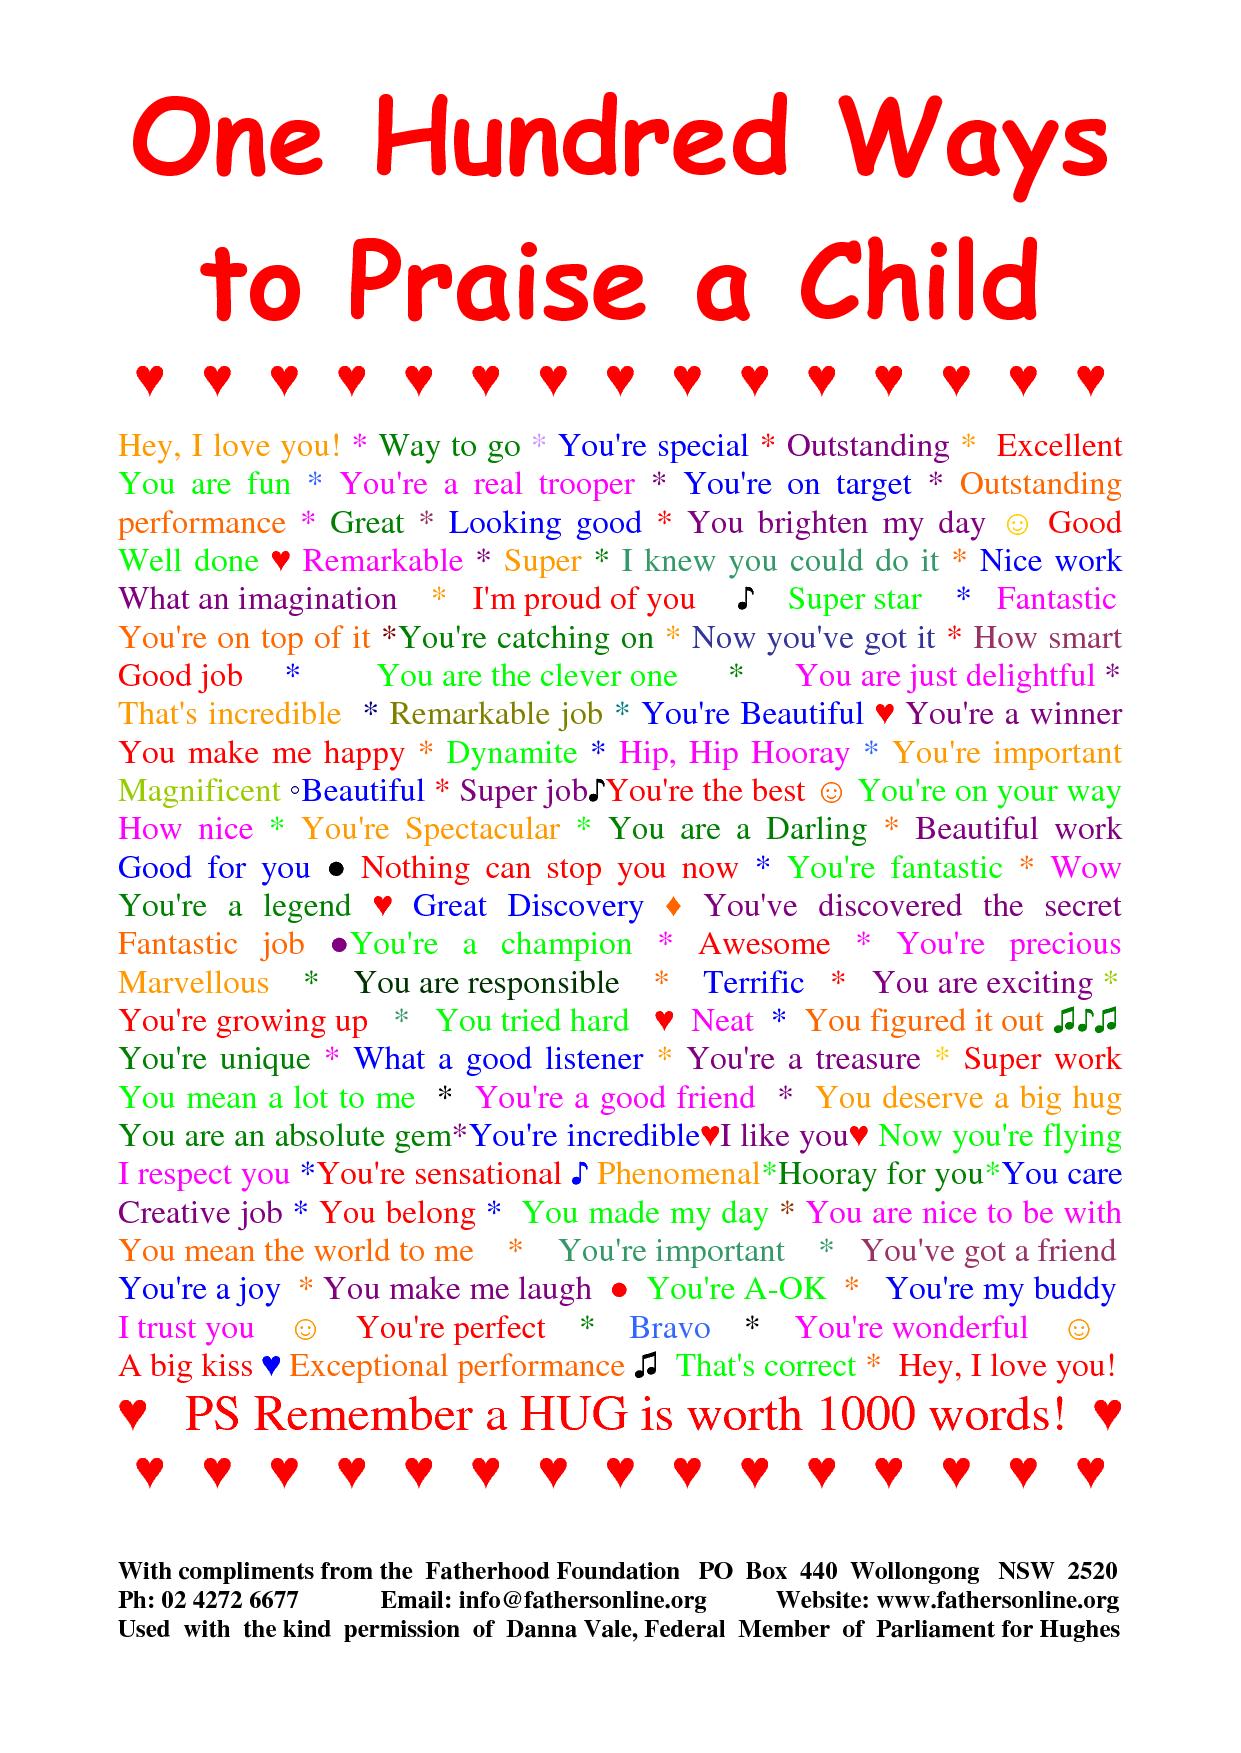 100 Ways To Praise Your Child